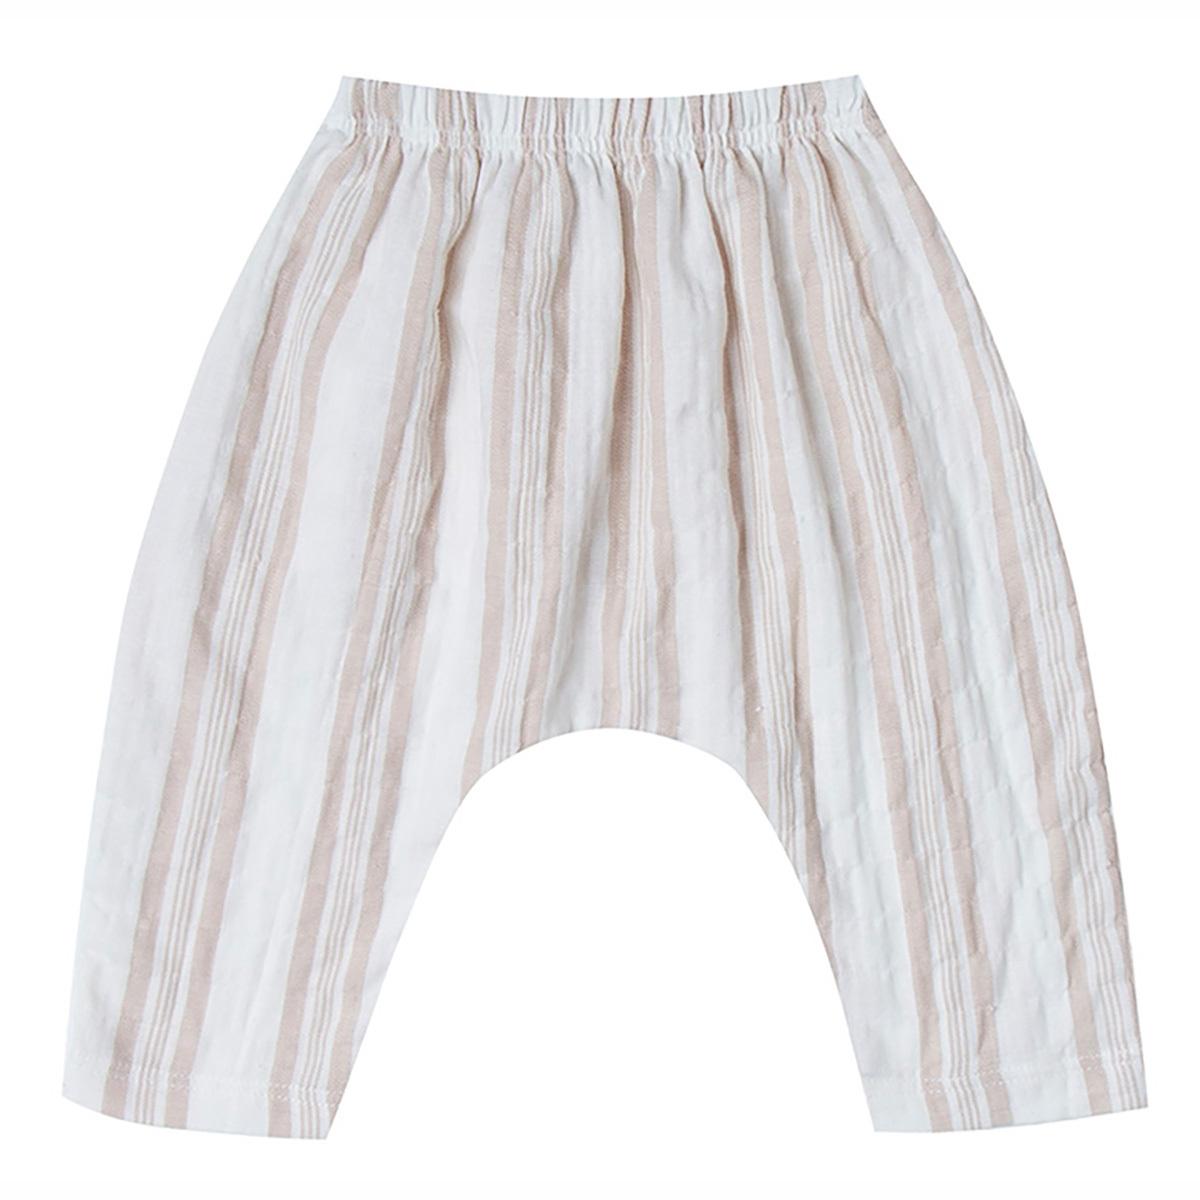 Bas bébé Pantalon à Rayures - Sand - 18/24 Mois Pantalon à Rayures - Sand - 18/24 Mois